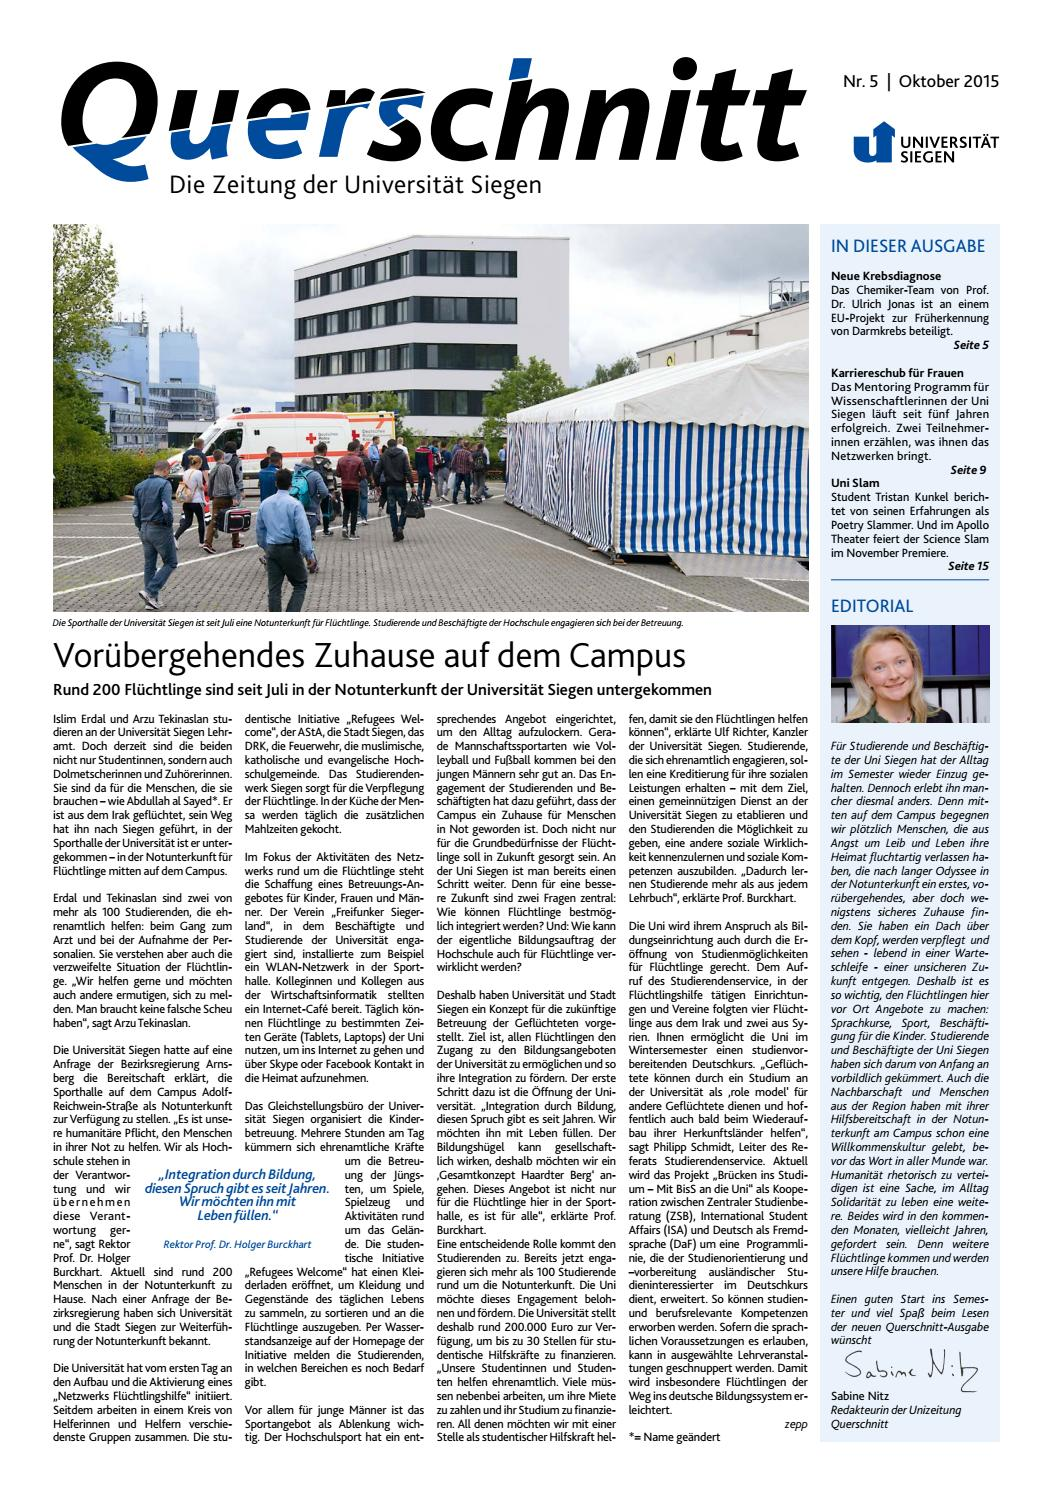 Querschnitt 05 / 2015 by Universität Siegen - issuu